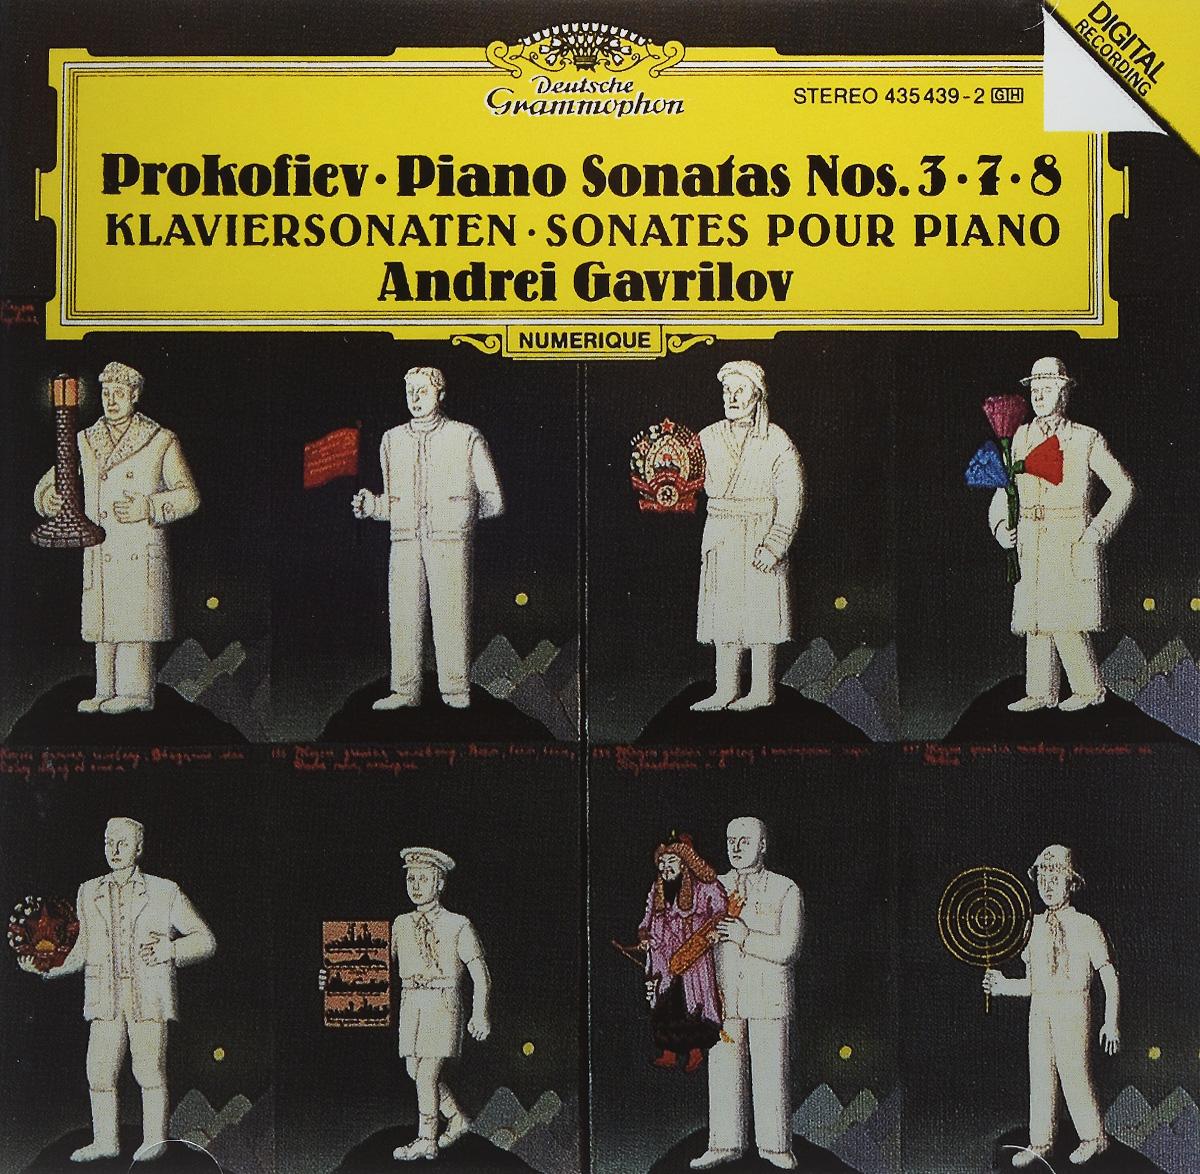 все цены на Андрей Гаврилов Andrei Gavrilov. Prokofiev. Piano Sonatas Nos. 3 / 7 / 8 онлайн